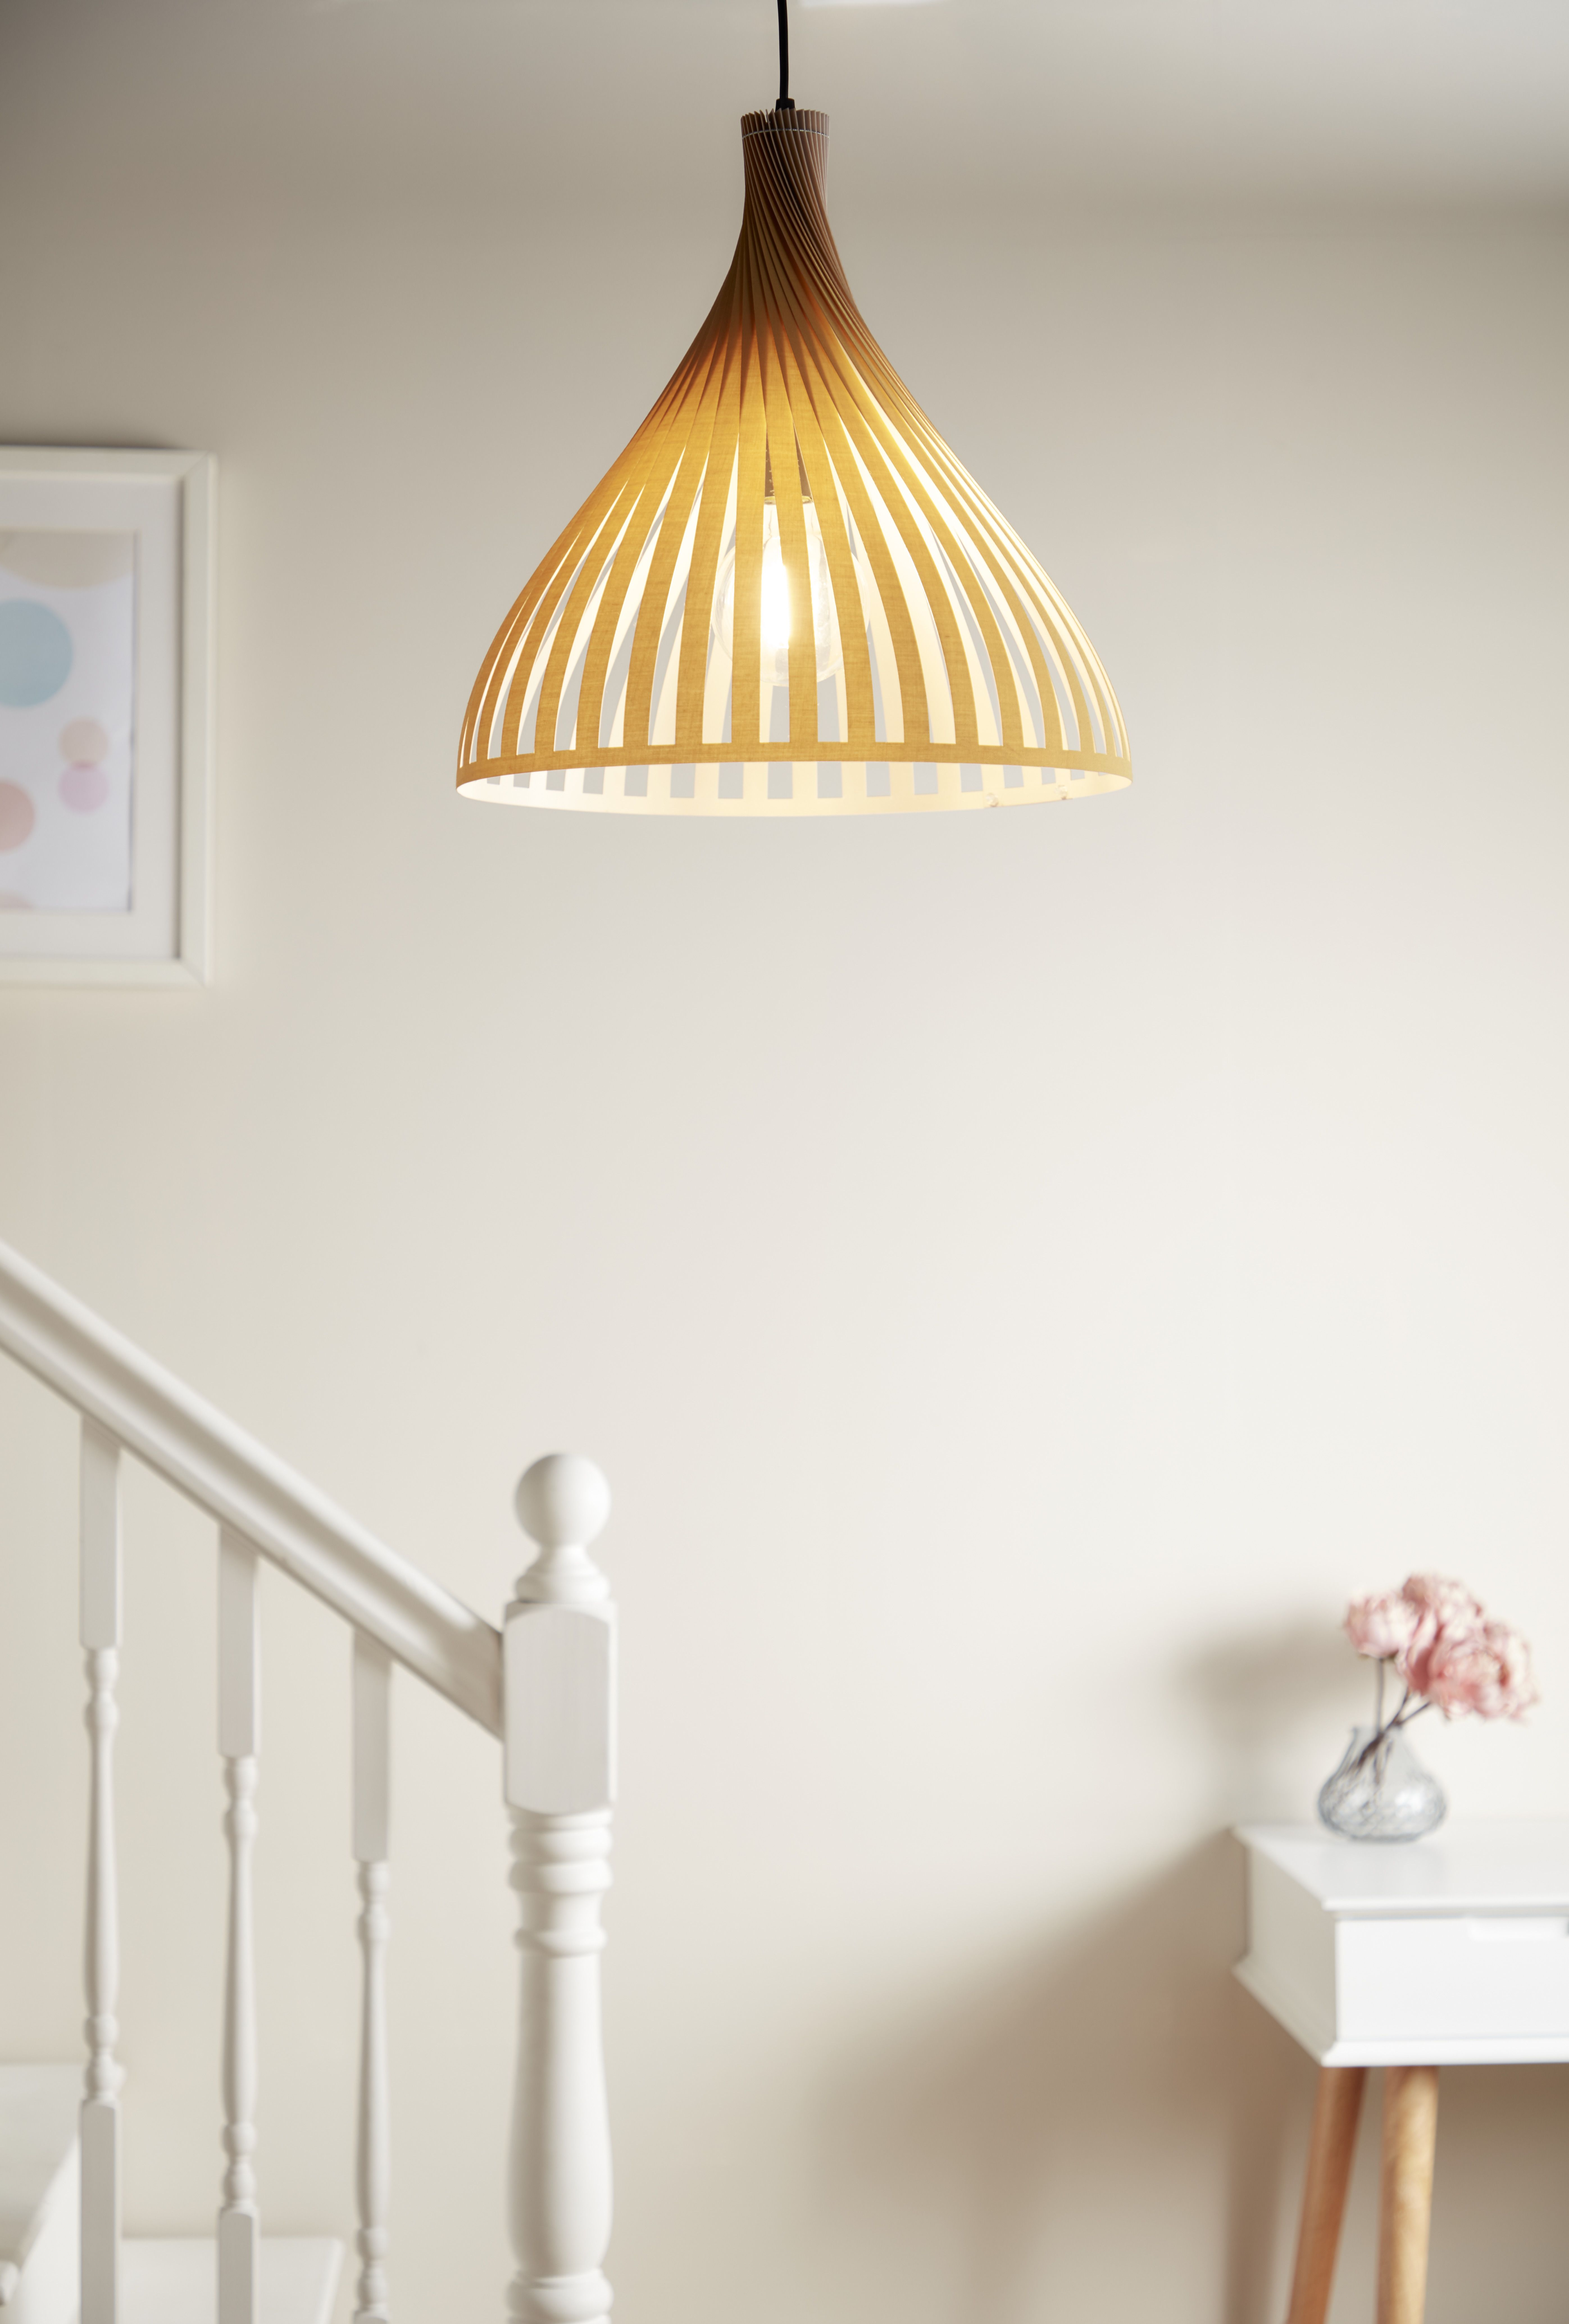 Lampa Wiszaca Goodhome Crozon 1 Punktowa E27 Drewno Decor Pendant Light Home Decor